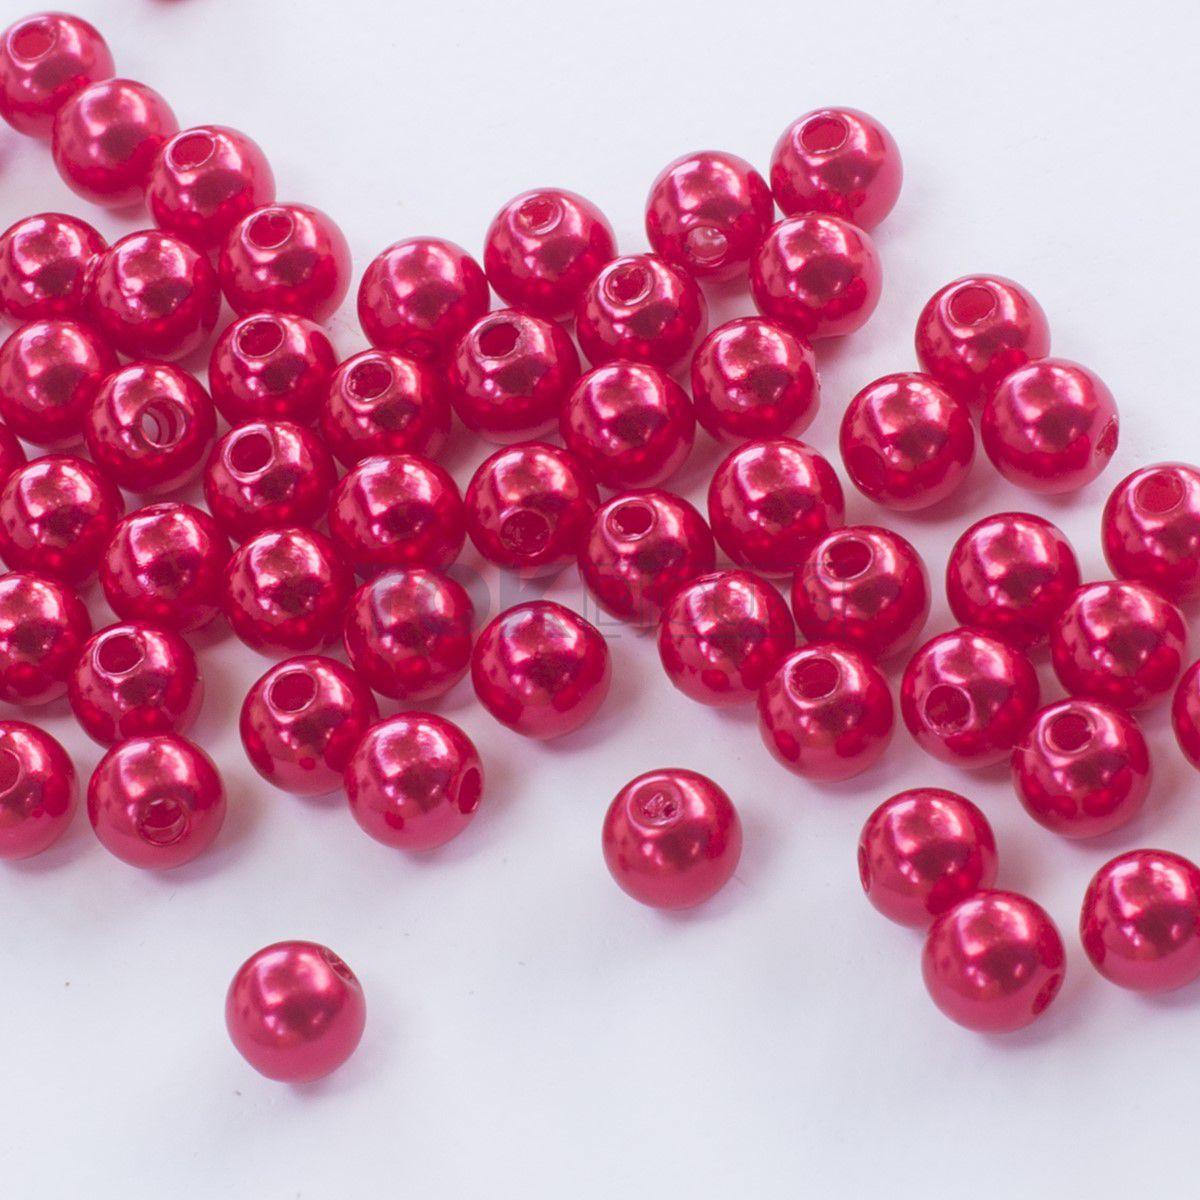 Pérola Redonda Abs 6mm - Vermelho - 25g